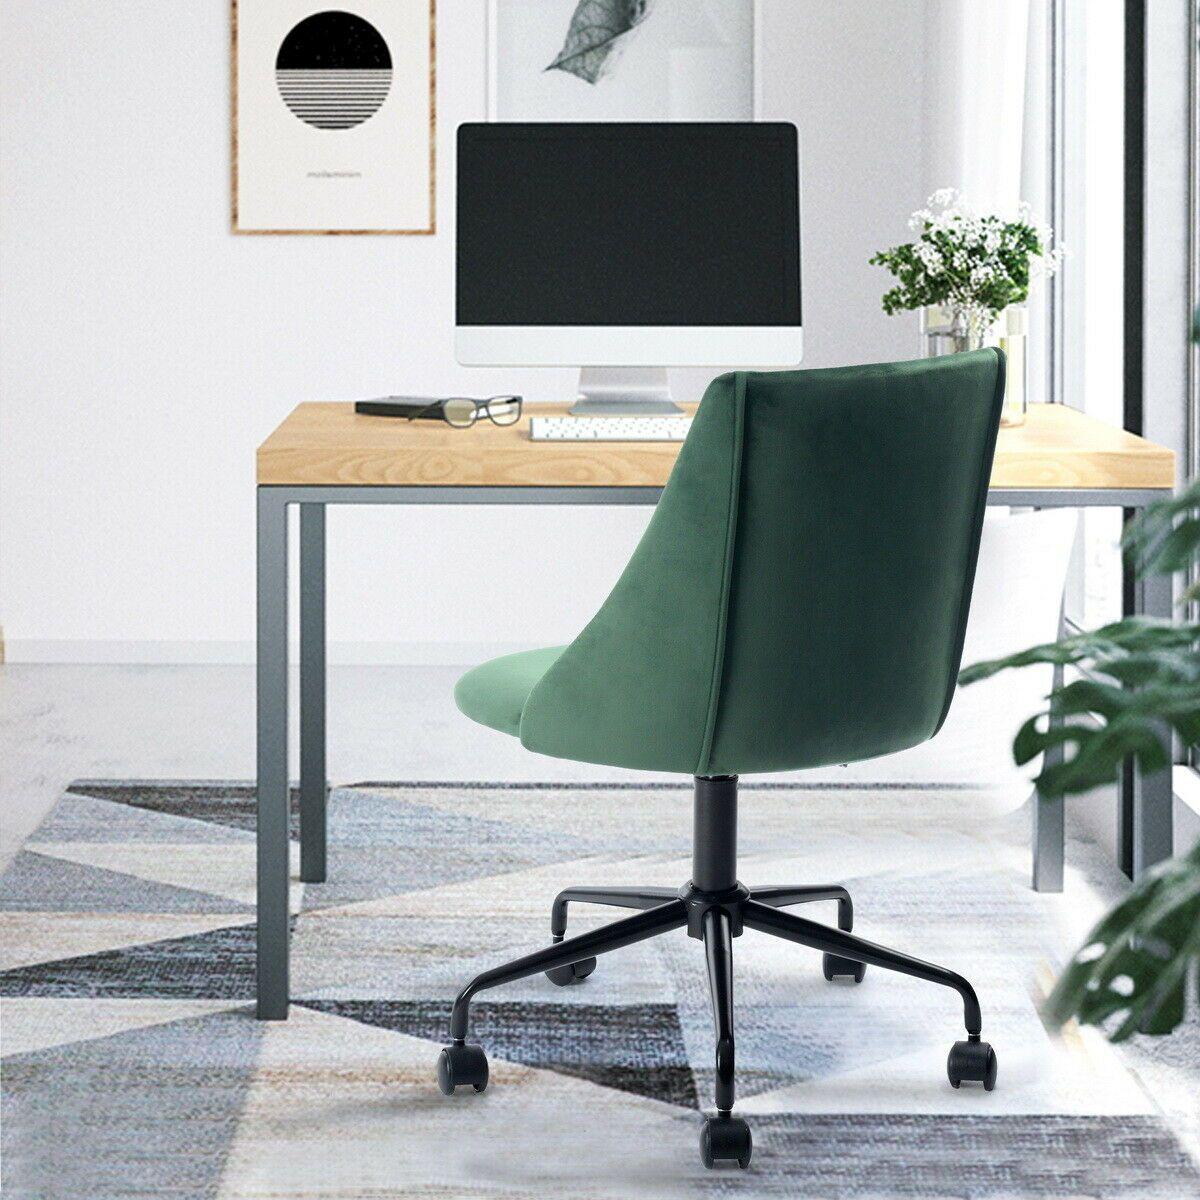 Ergonomic Desk Chair Adjustable Swivel Office Accent Chair ...